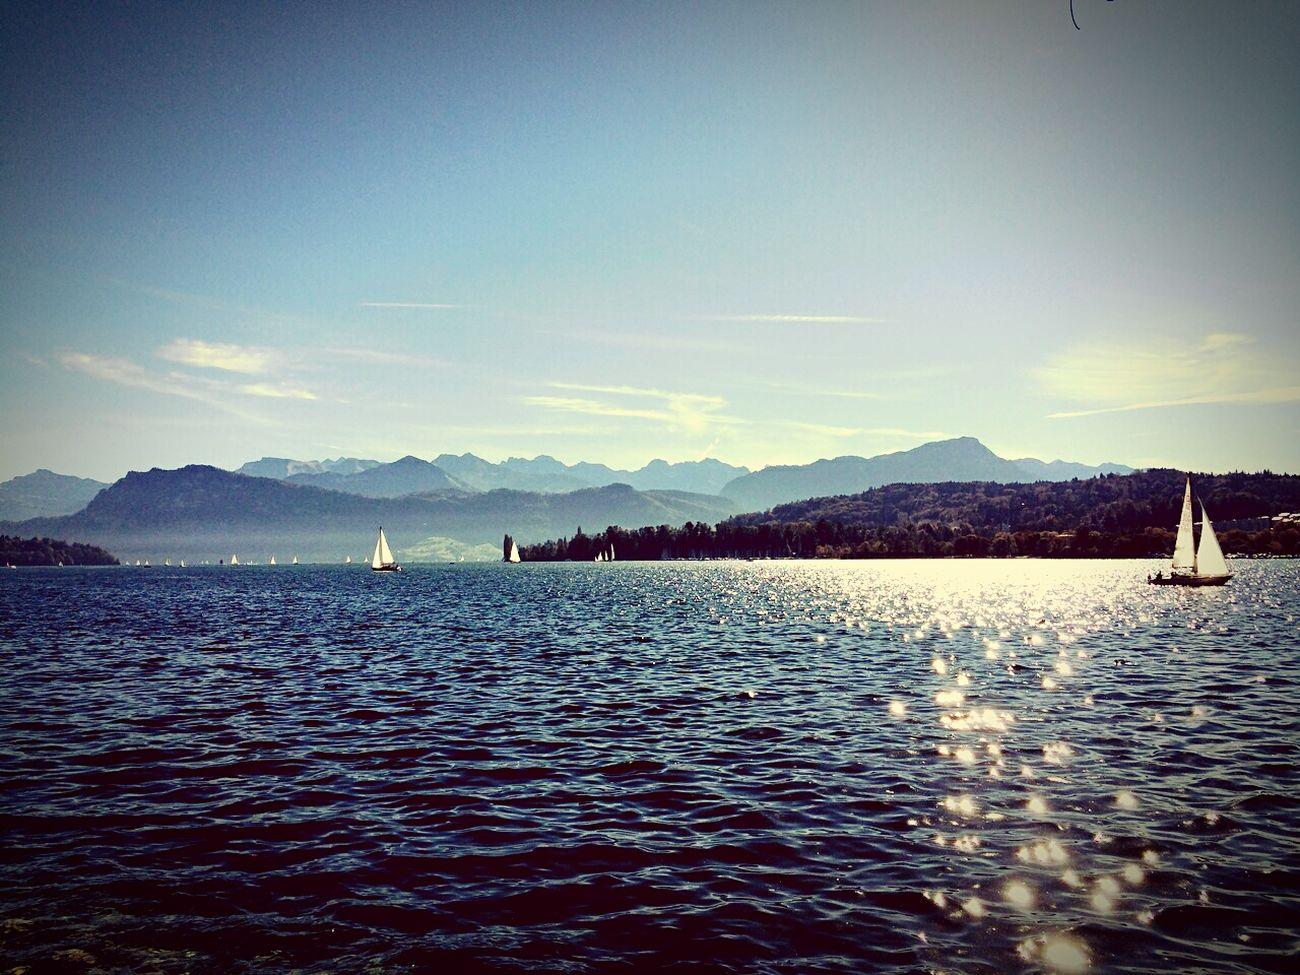 Taking Pictures Svizzera Nature Lake View Swiss Luzern Trip Great View